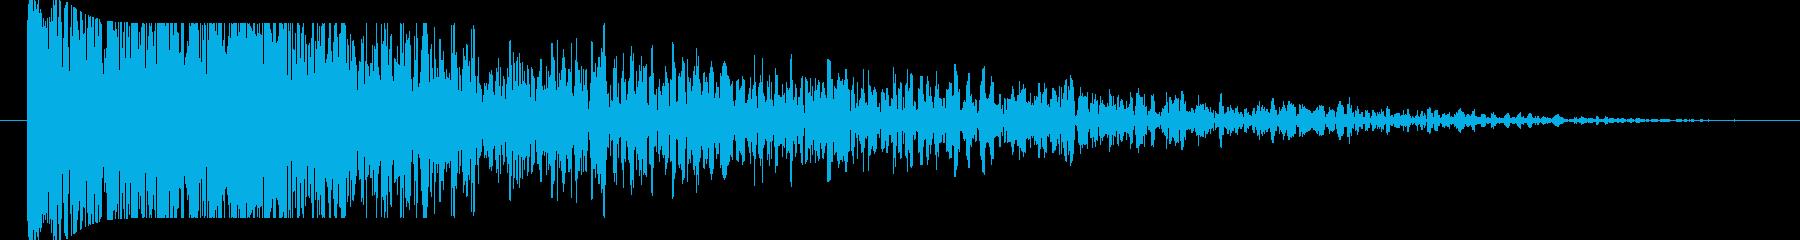 FX 大爆発01の再生済みの波形